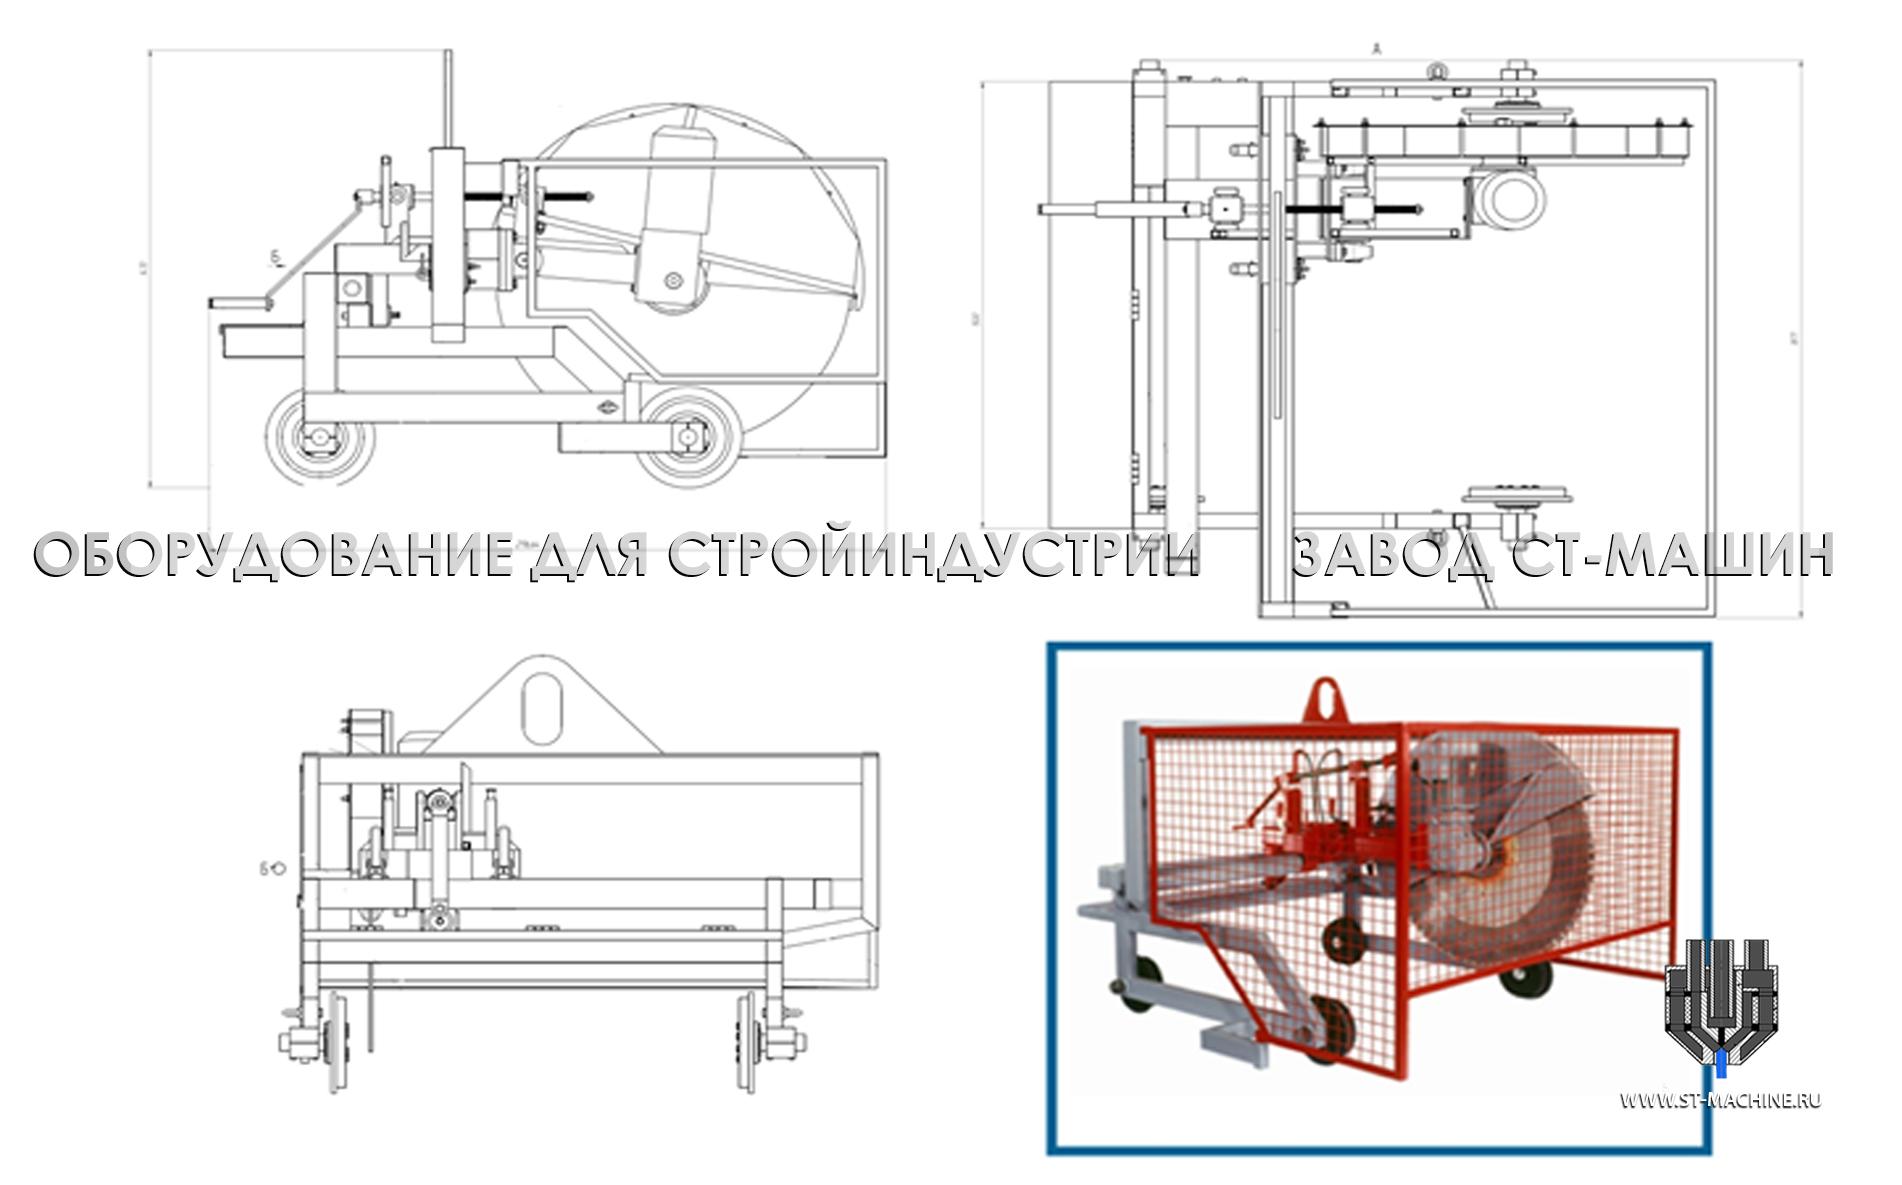 st-machine-mashina-rezki-po-gidkomy-betonu-ст-машин-оборудование для стройиндустрии.jpg